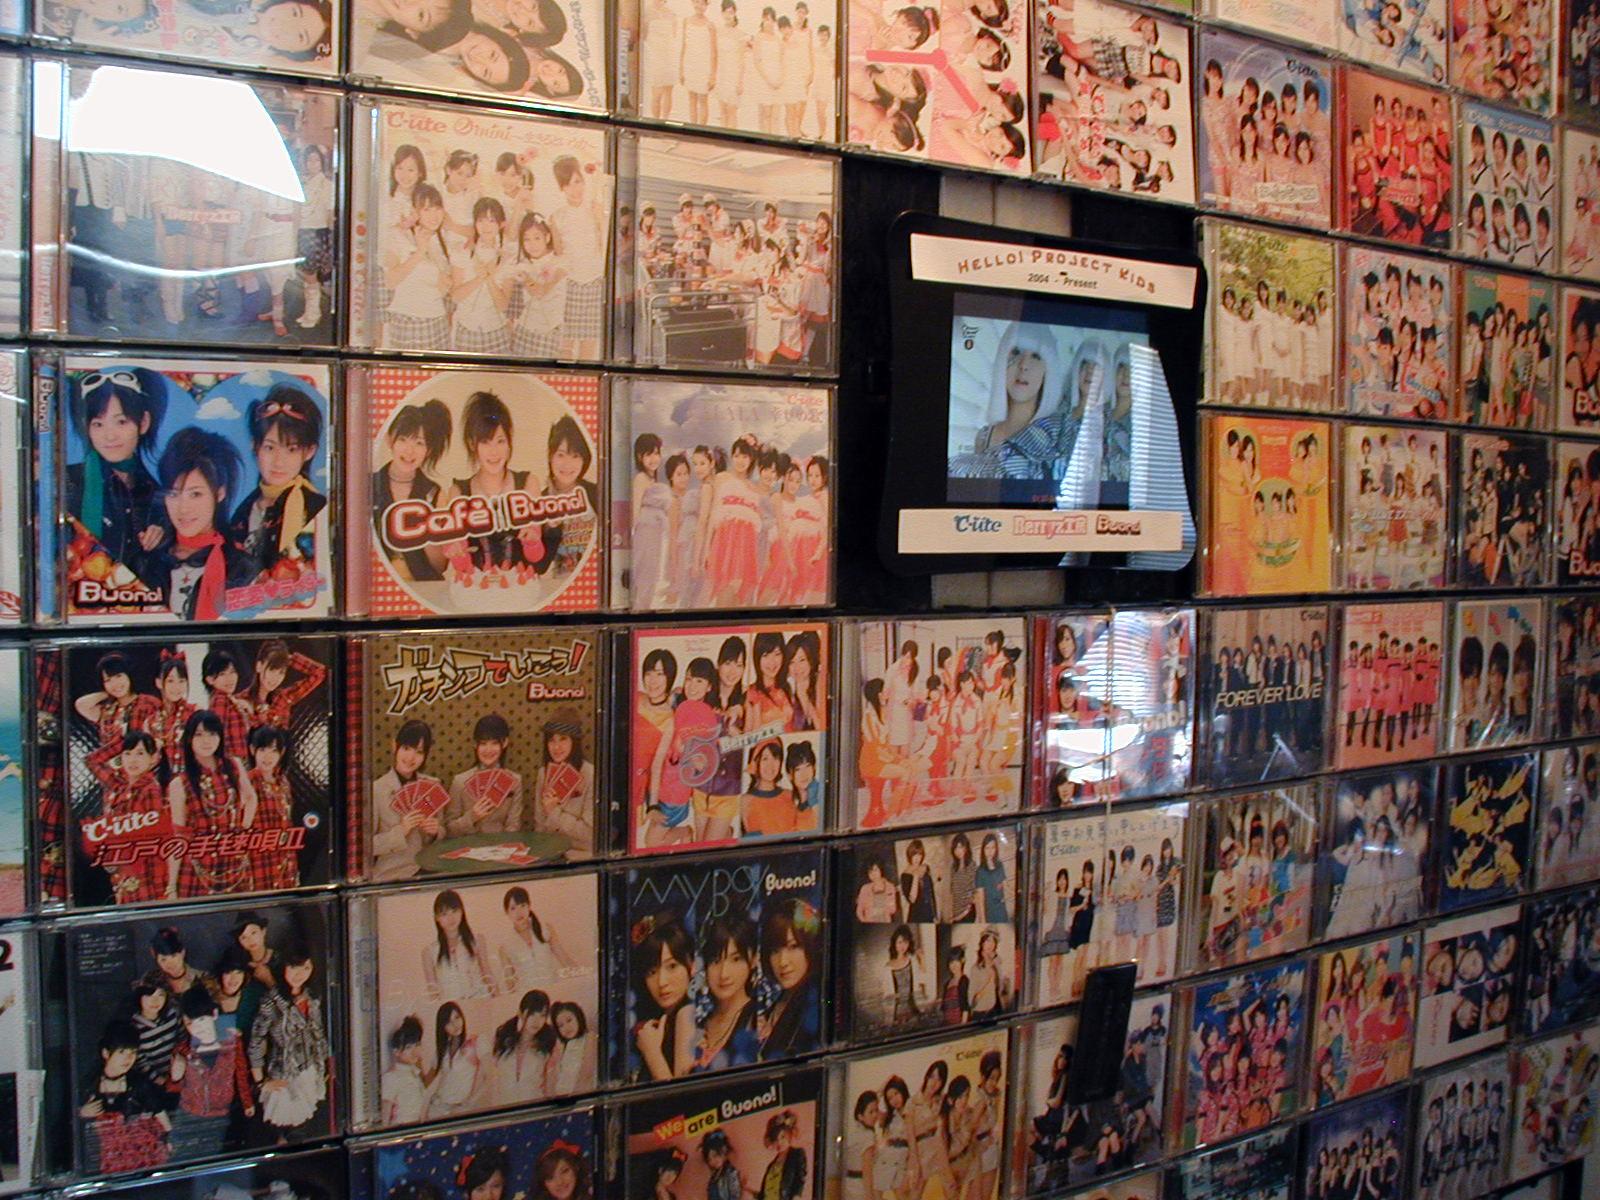 Closeup of KIDS discography wall